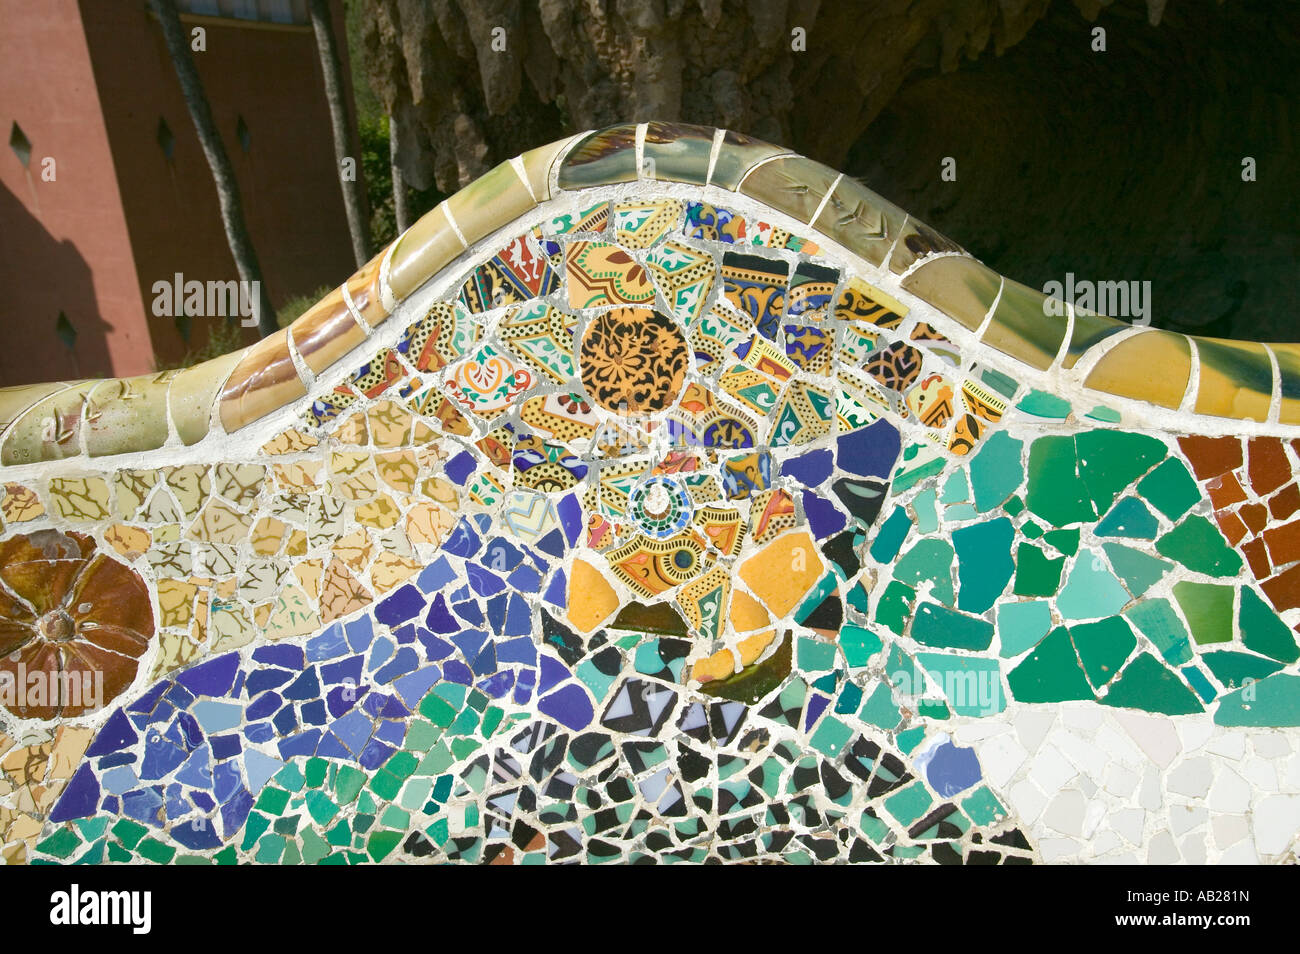 Парк гуэль в барселоне карта схема